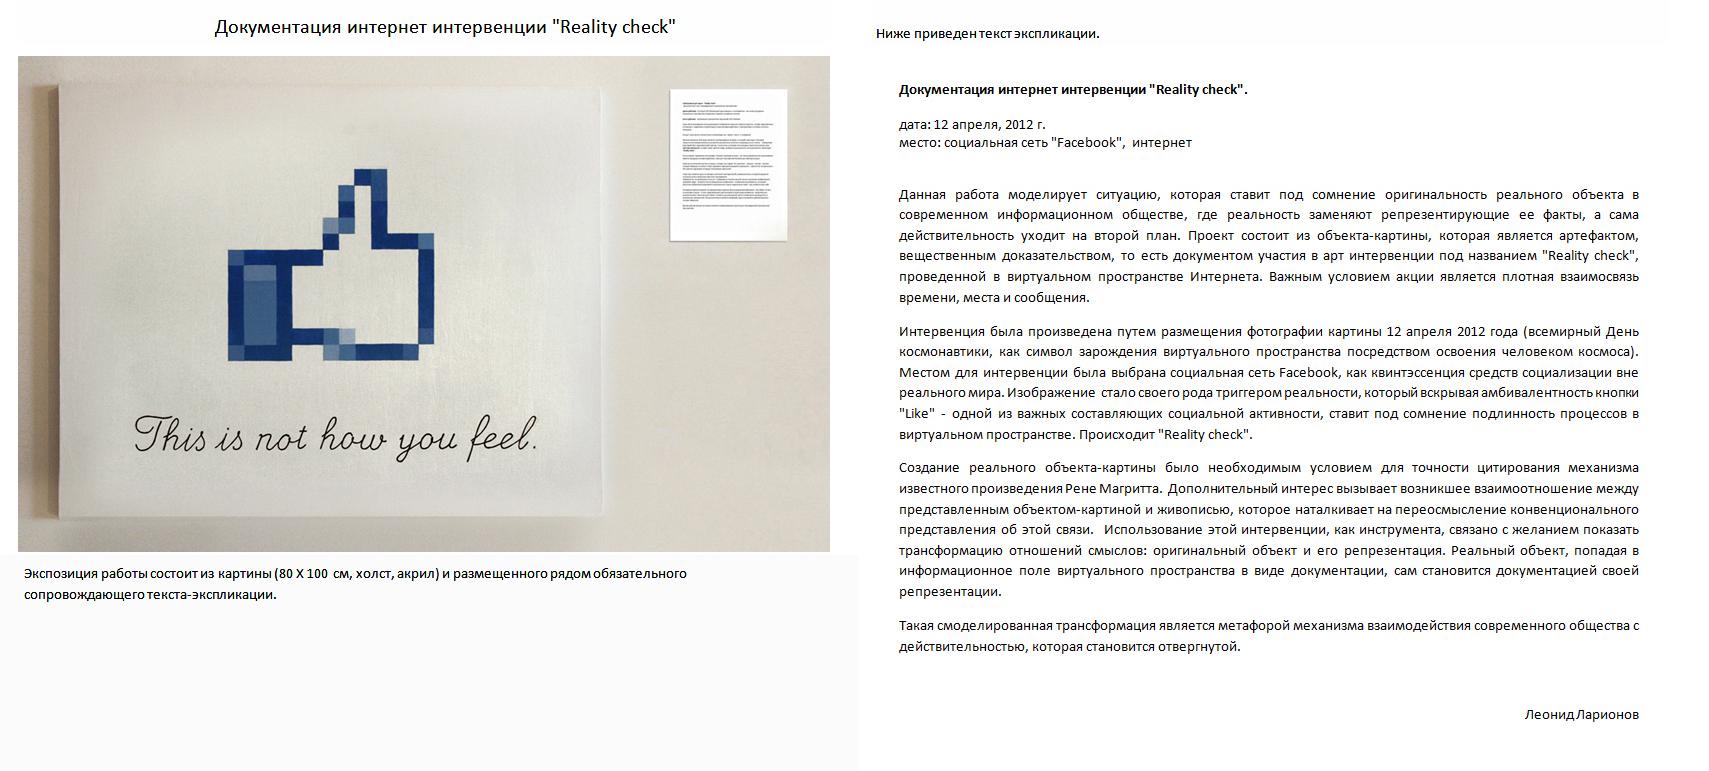 "интернет интервенции ""Reality сheck"""